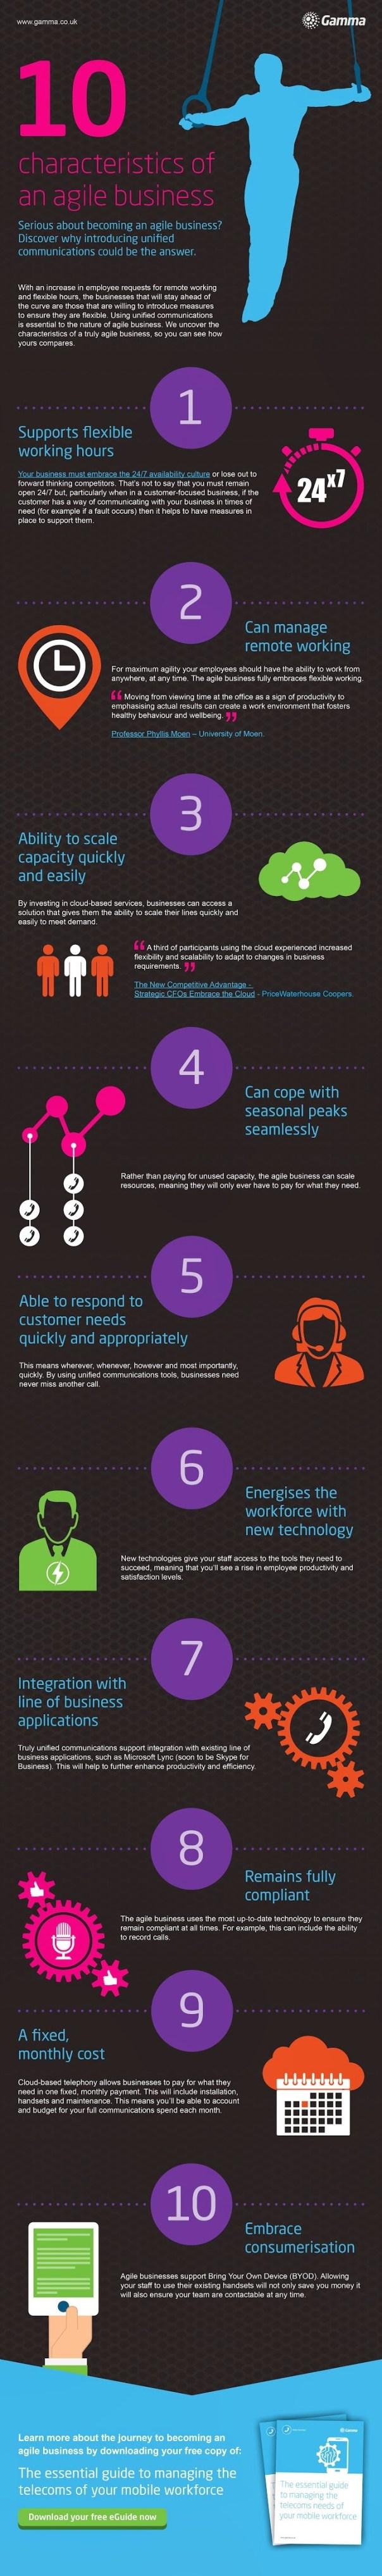 10 characteristics of an agile business